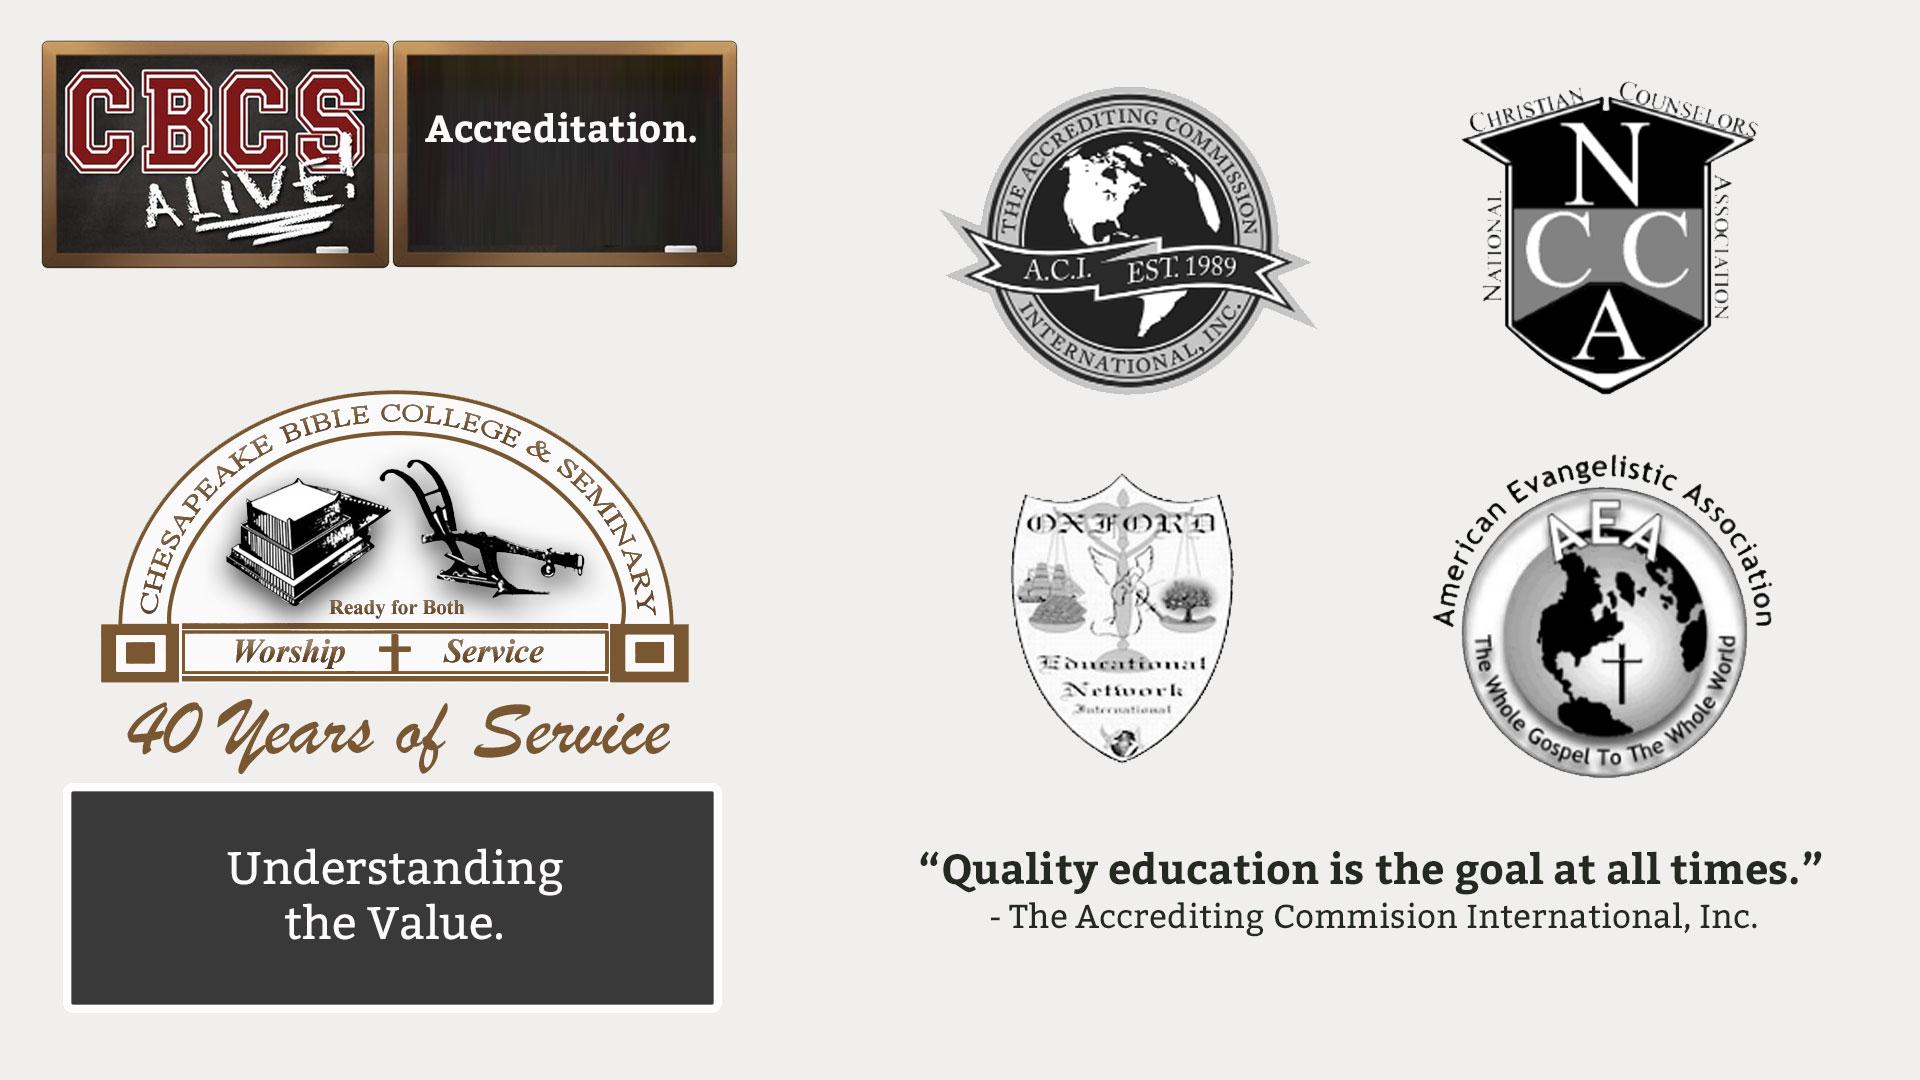 Chesapeake Bible College & Seminary - Accreditation